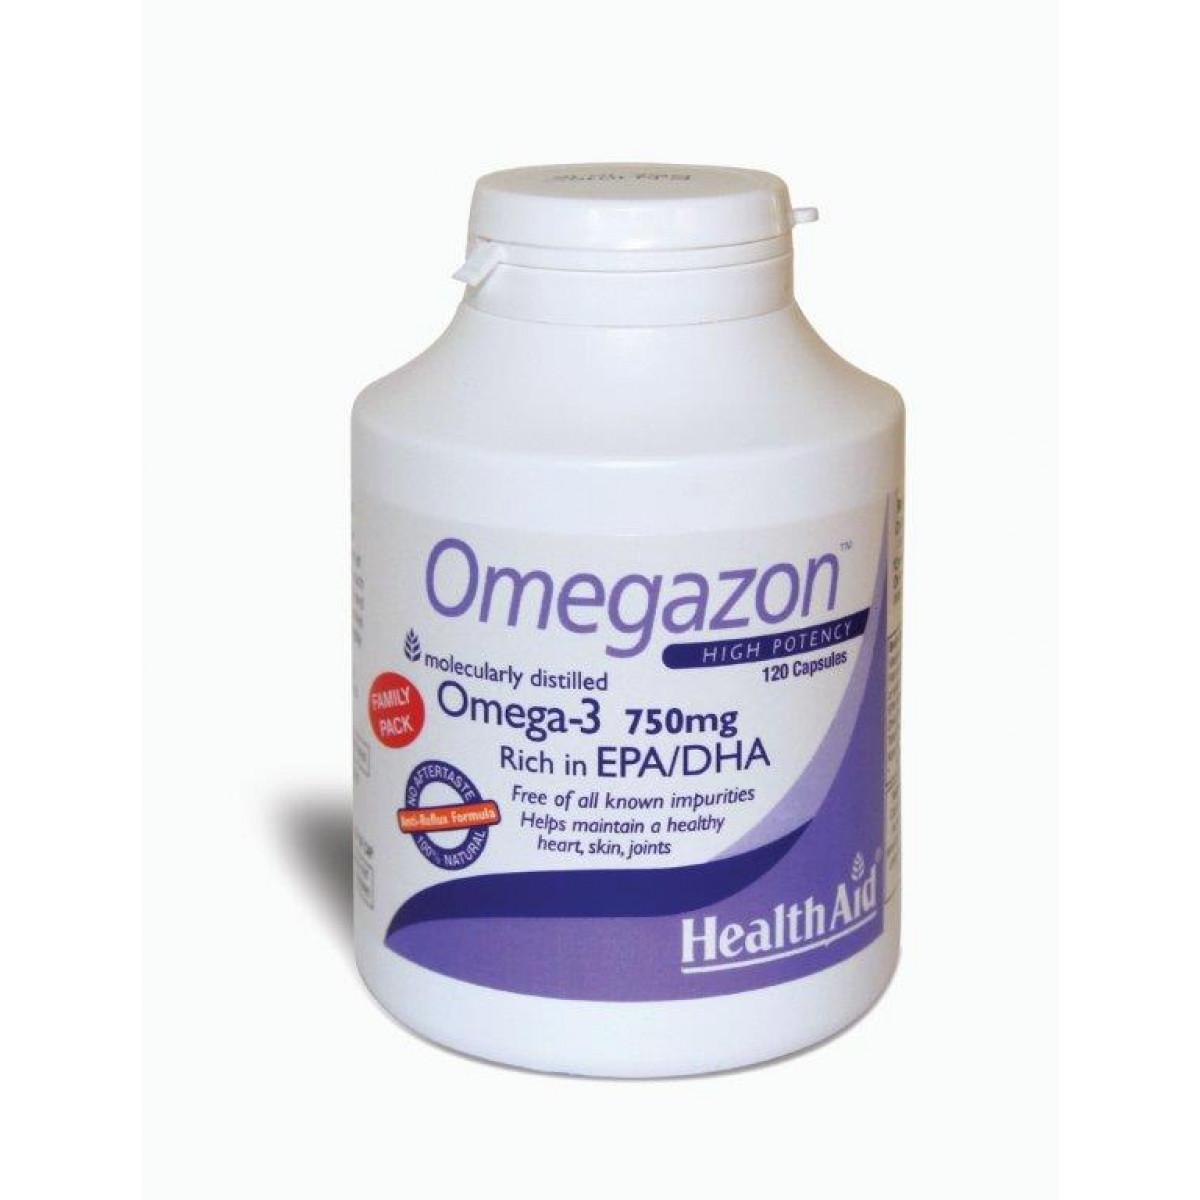 Health Aid High Potency Omegazon 750mg 120Caps Doctor Pharmacy